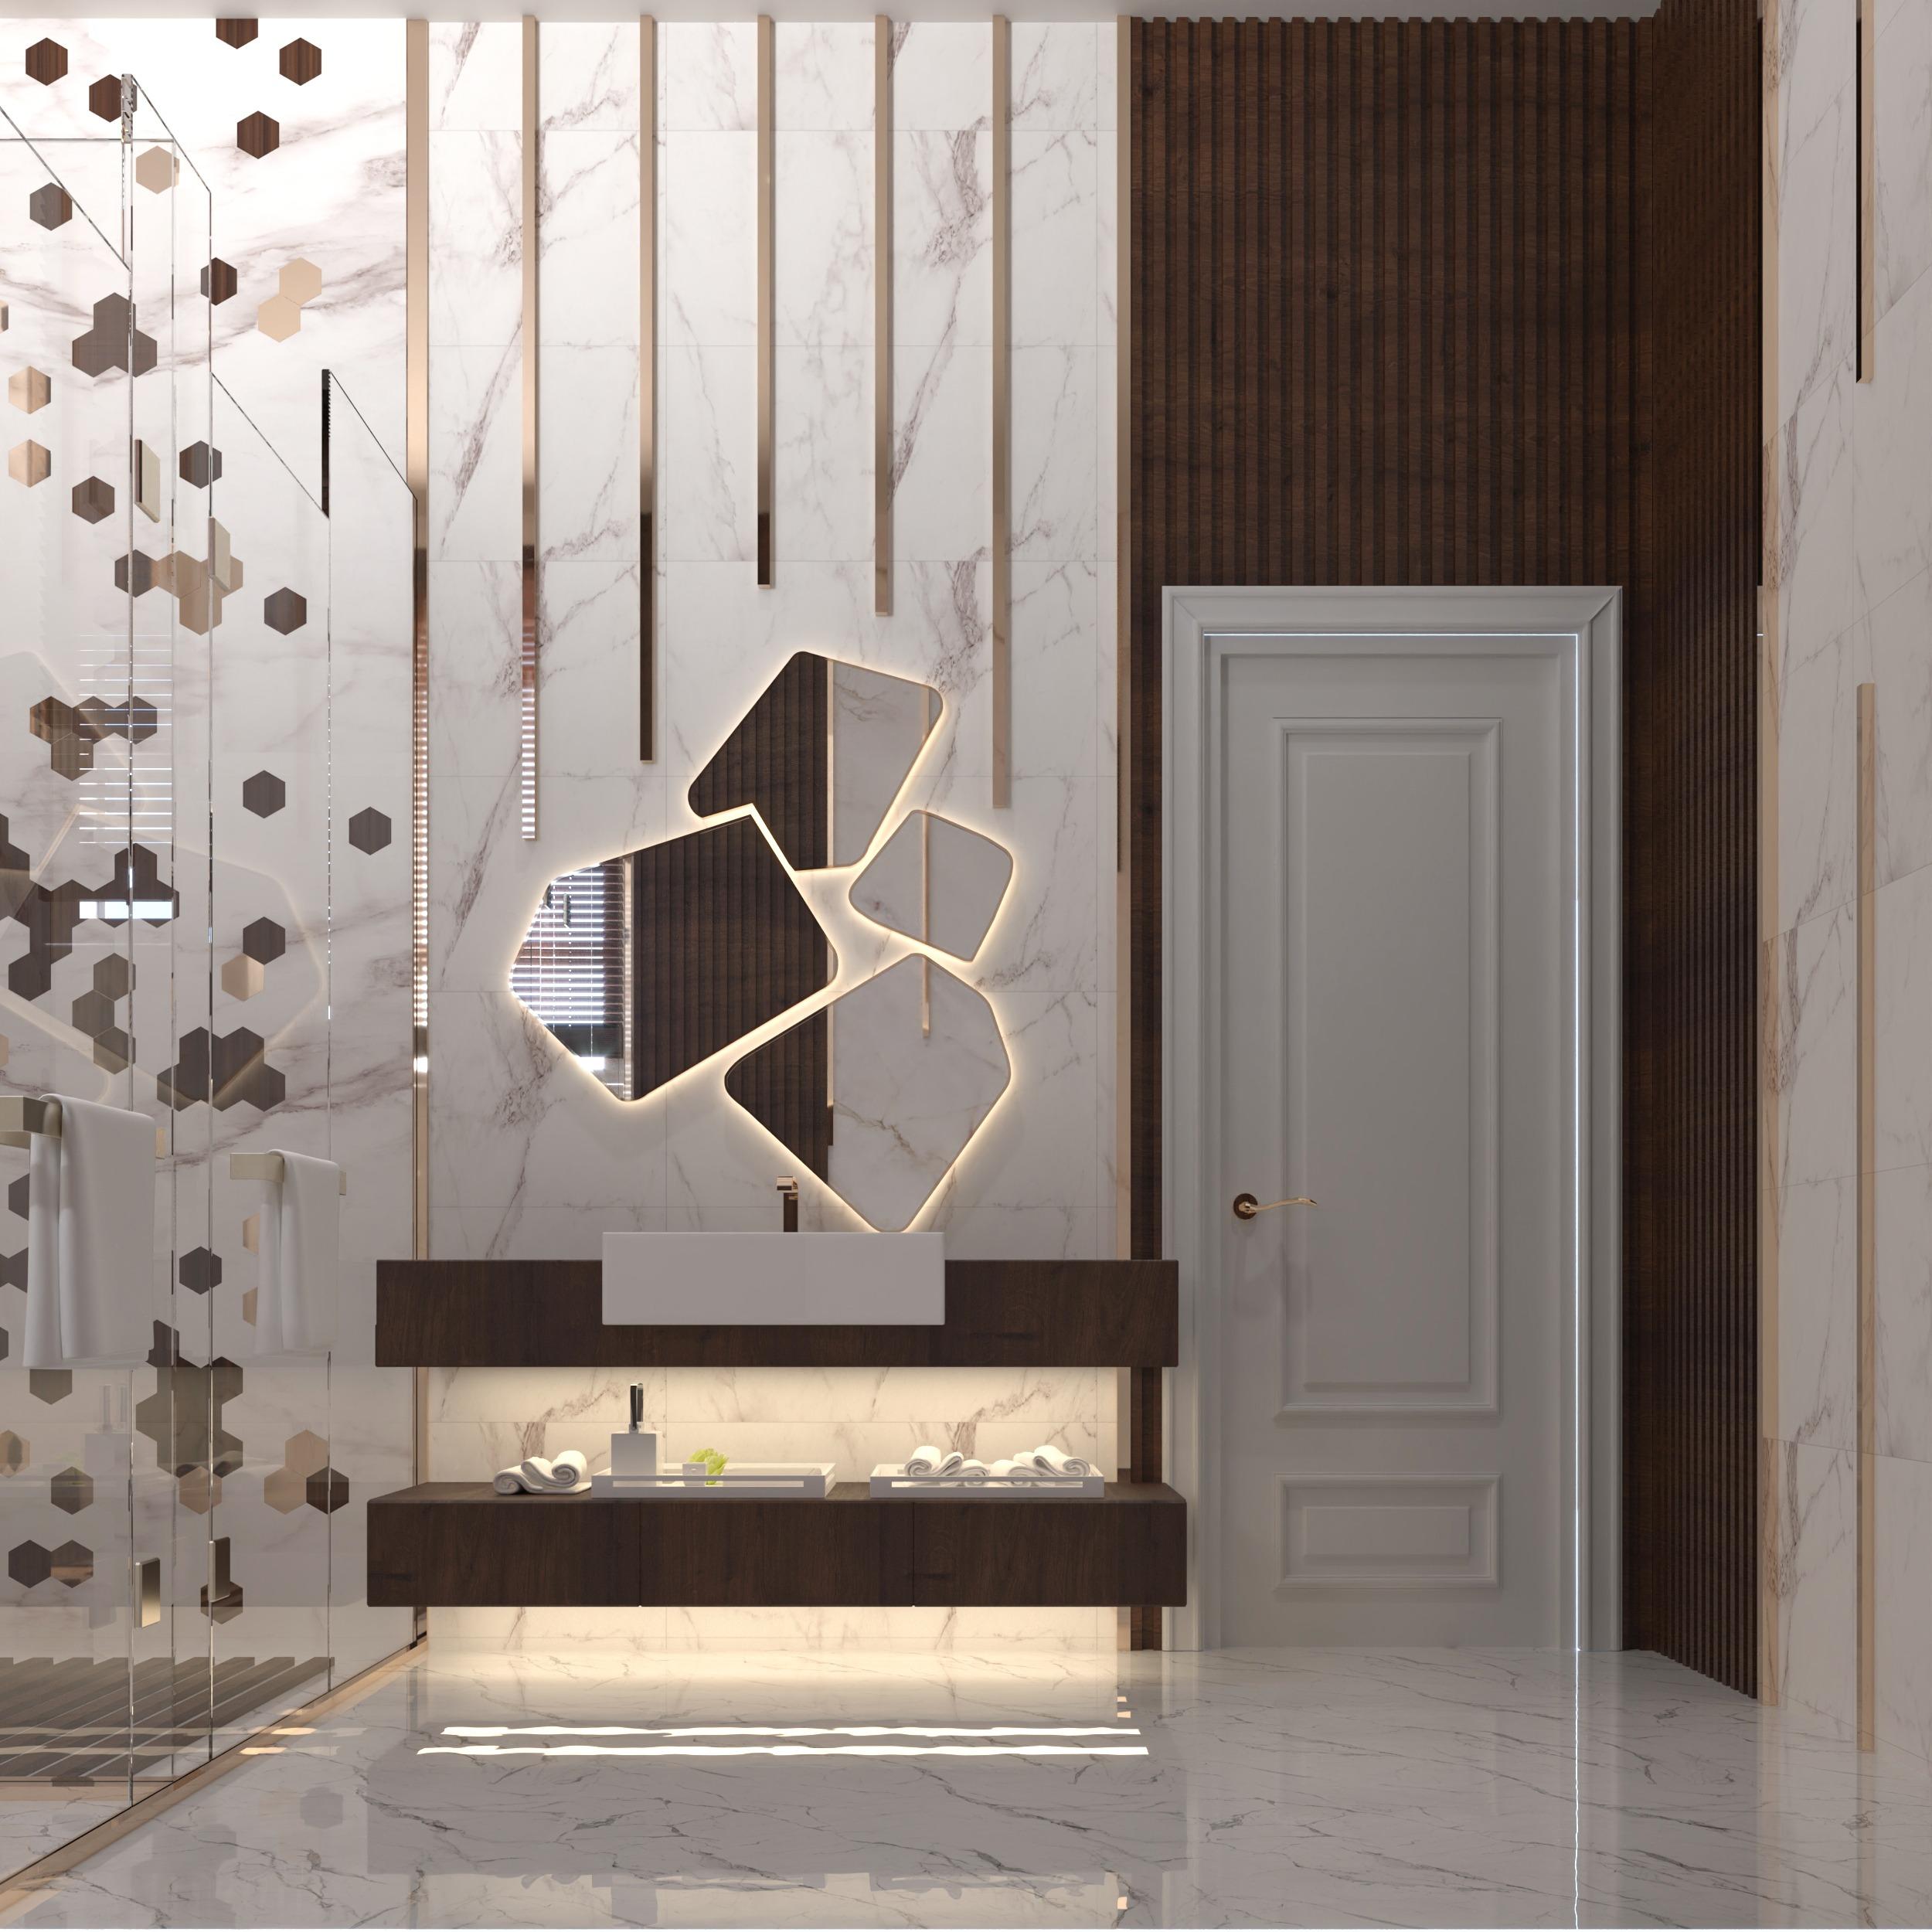 MODERN STYLE - BATHS DESIGN - UNIQUE -WELL DESIGNED BATHROOMS